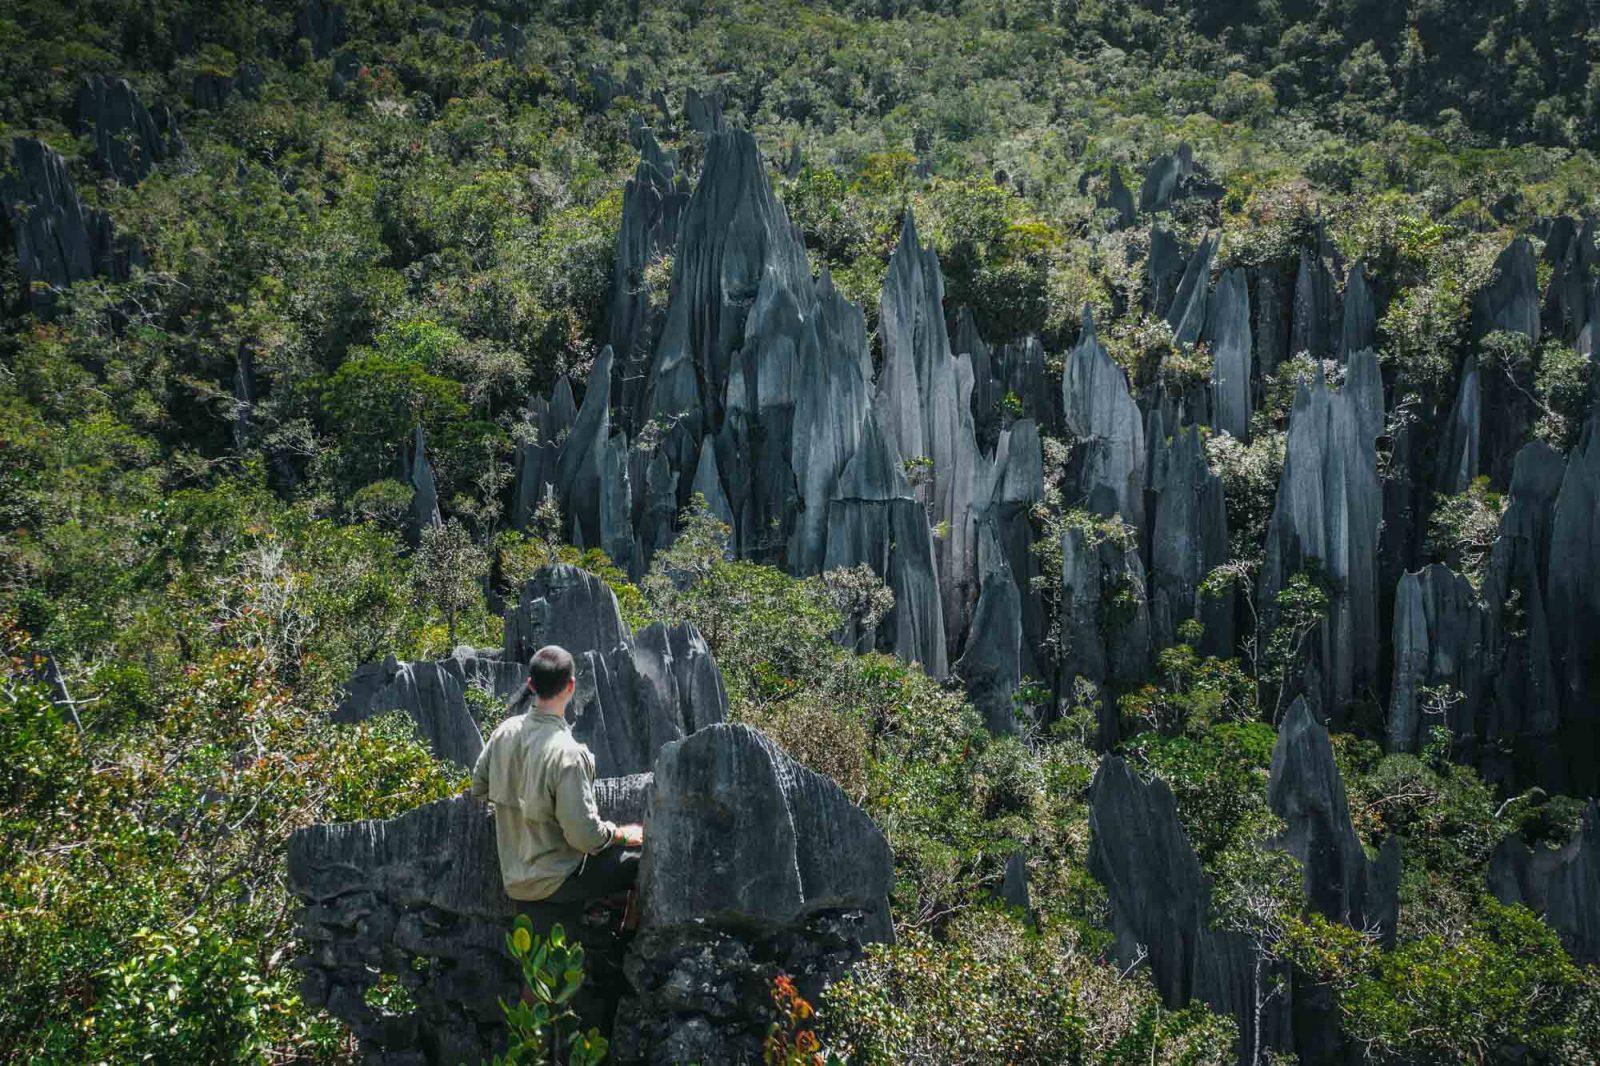 Exploring Mulu Caves at Gunung Mulu National Park in Sarawak, Malaysia |  Drink Tea & Travel